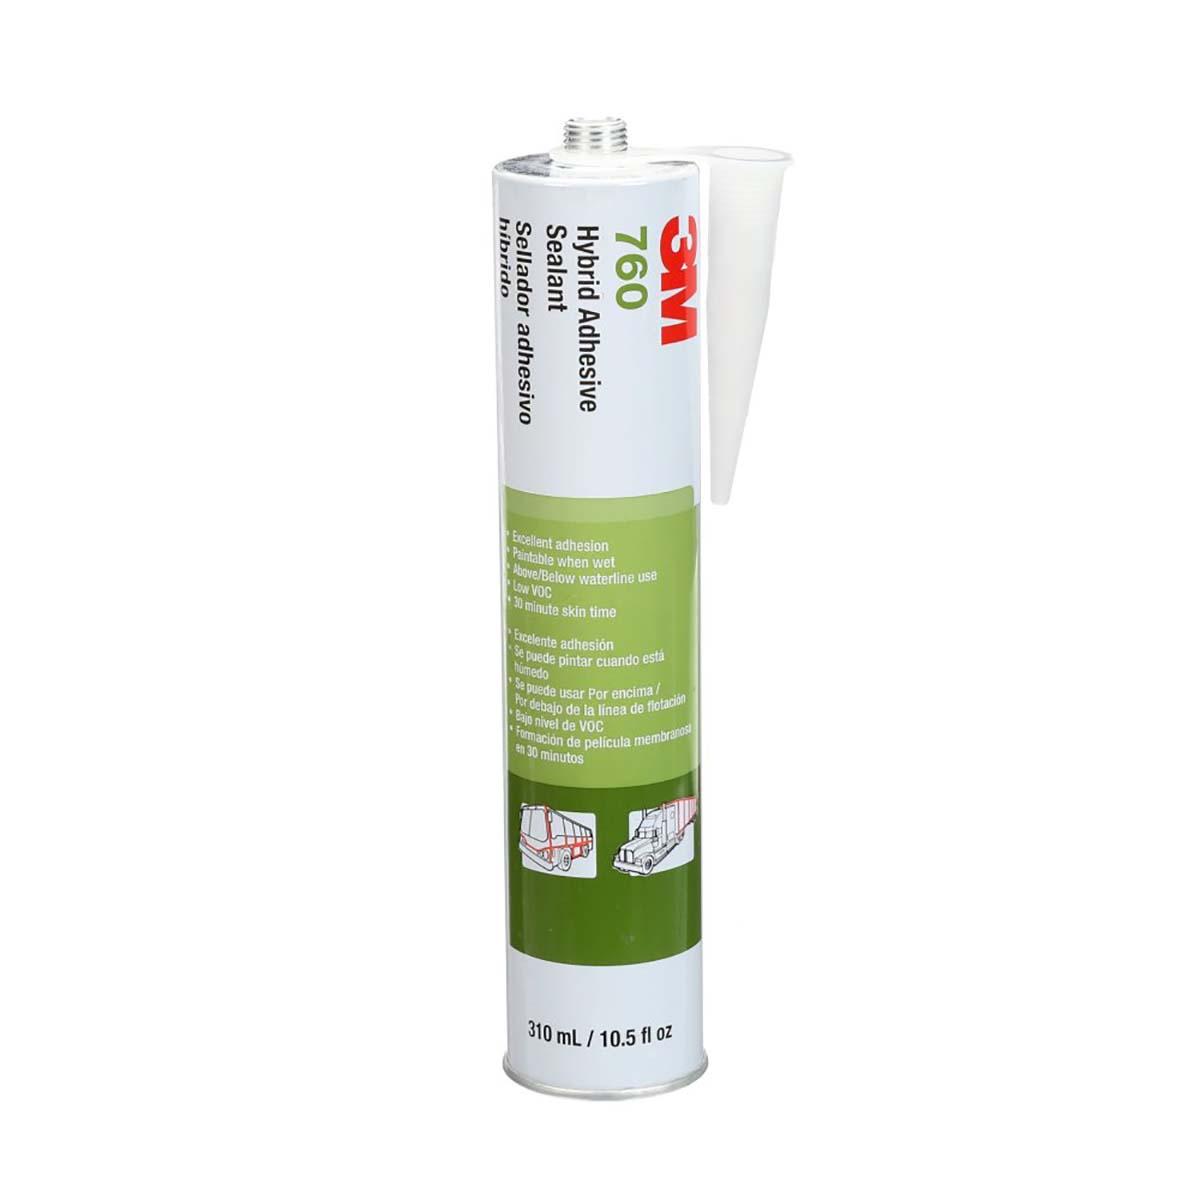 3M Adhesive Sealant 760 UV White, 290mL Cartridge, 12 per case.  NOT FOR RETAIL/CONSUMER USE.